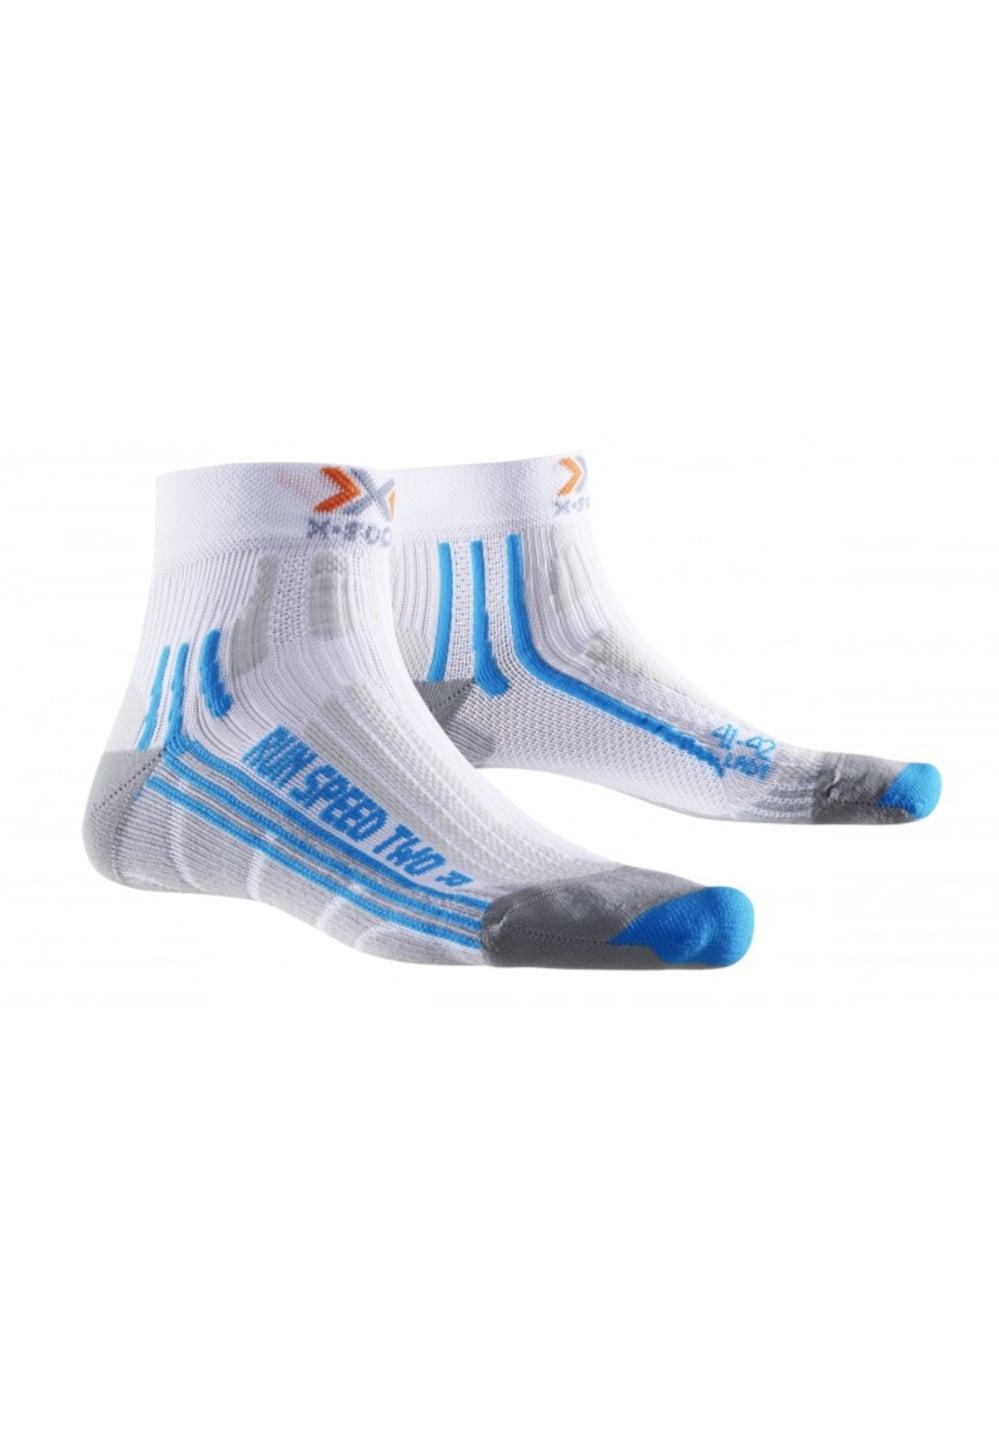 X-Socks Run Speed Two Laufsocken - Weiß, Gr. 39-40